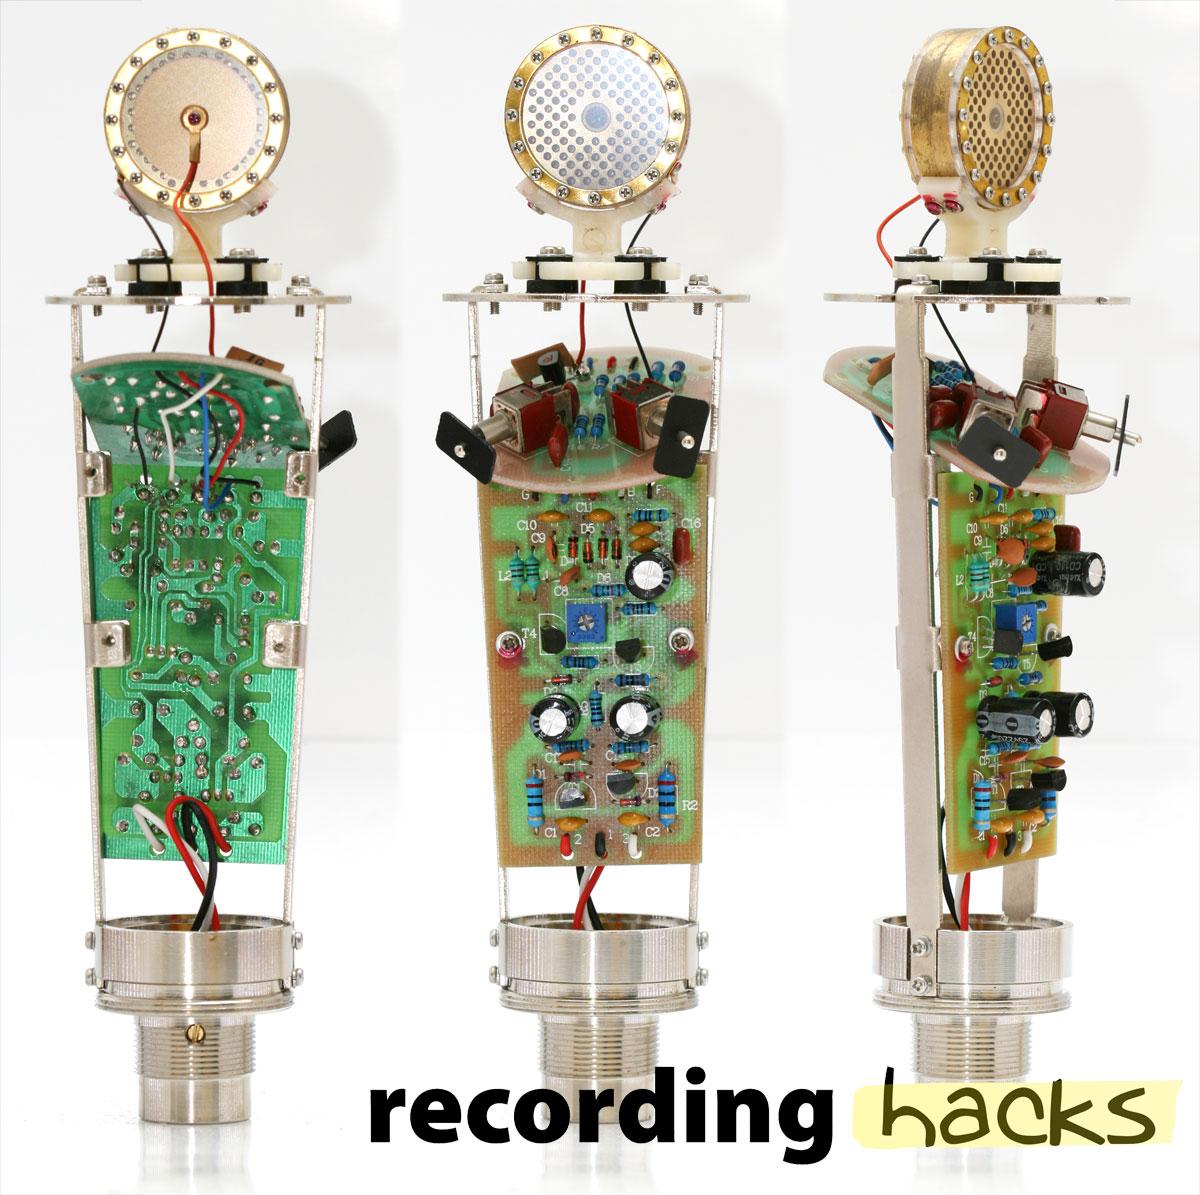 MXL 992 | RecordingHacks com